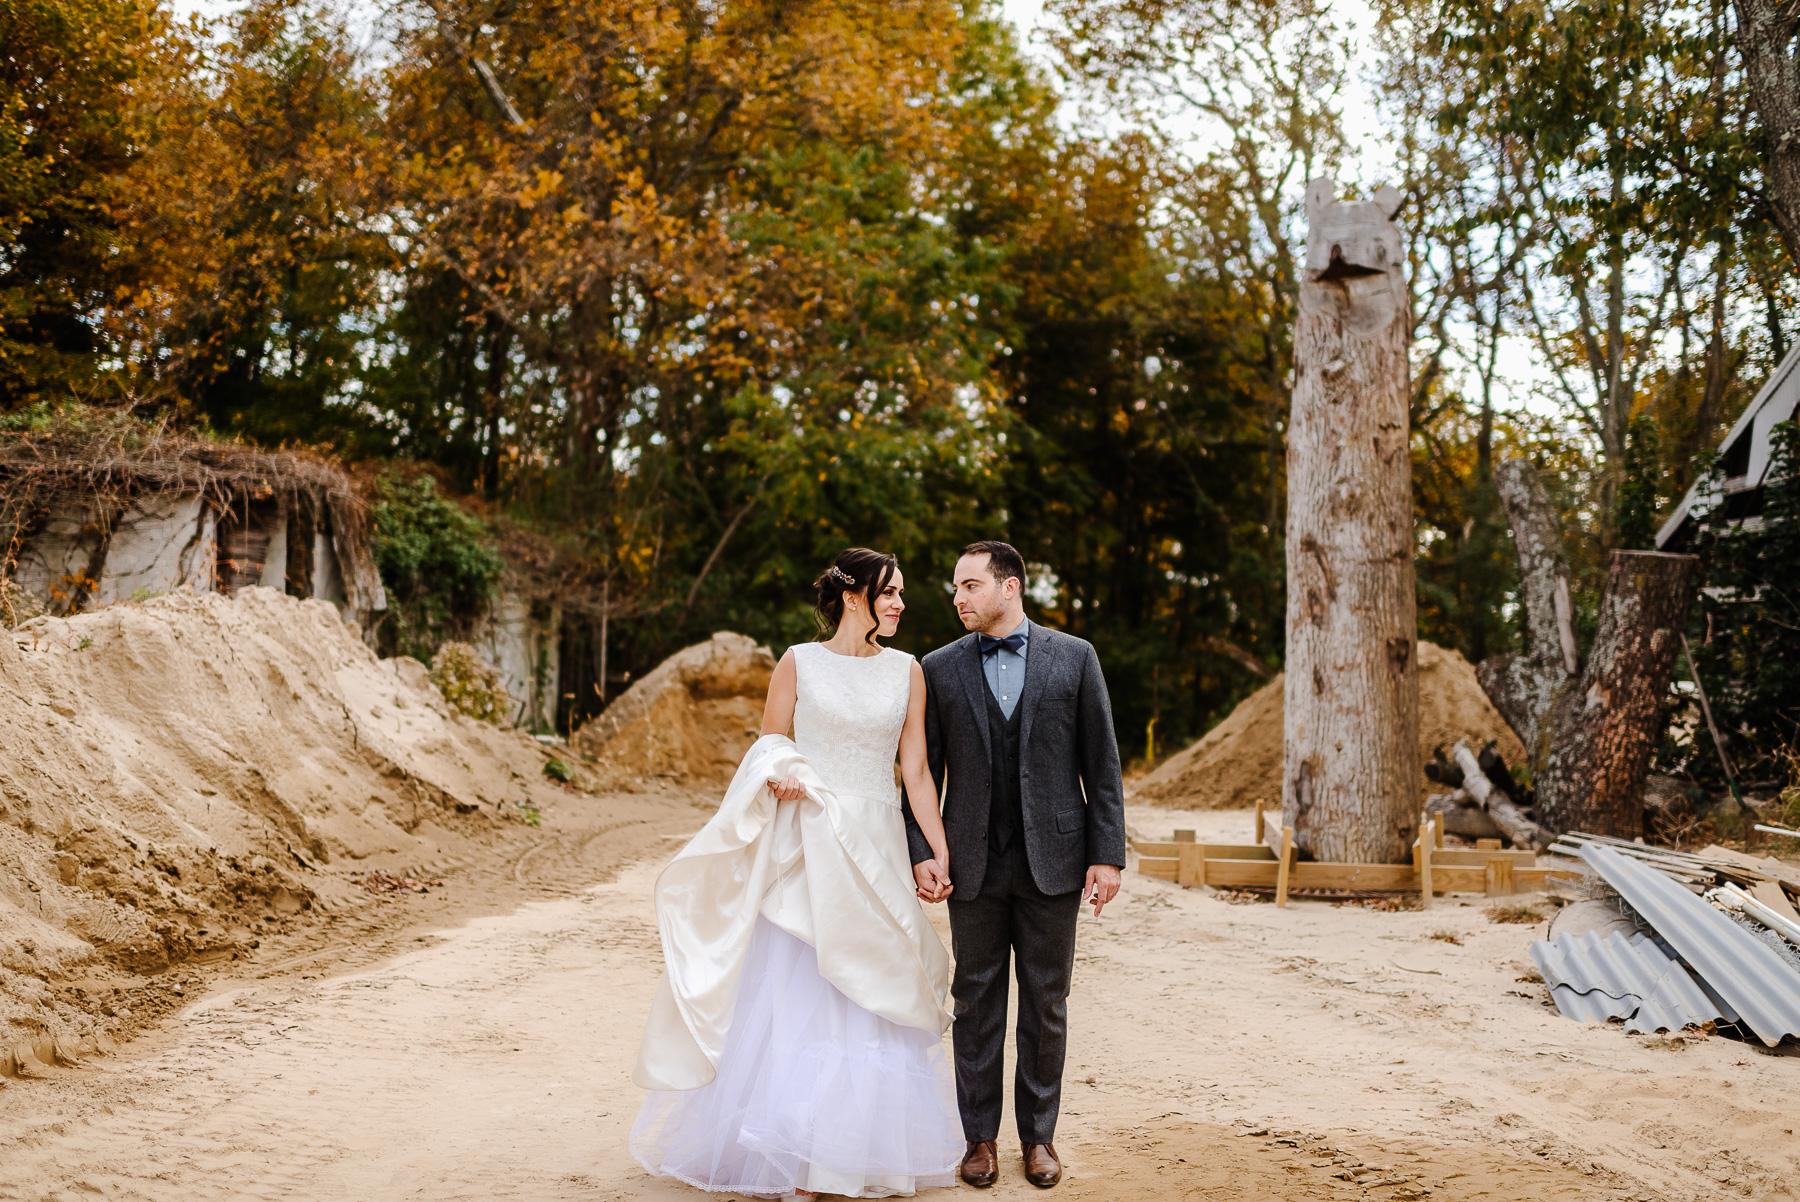 48-Laurita Winery Wedding New Jersey Wedding Photographer Laurita Winery Weddings Longbrook Photography.jpg